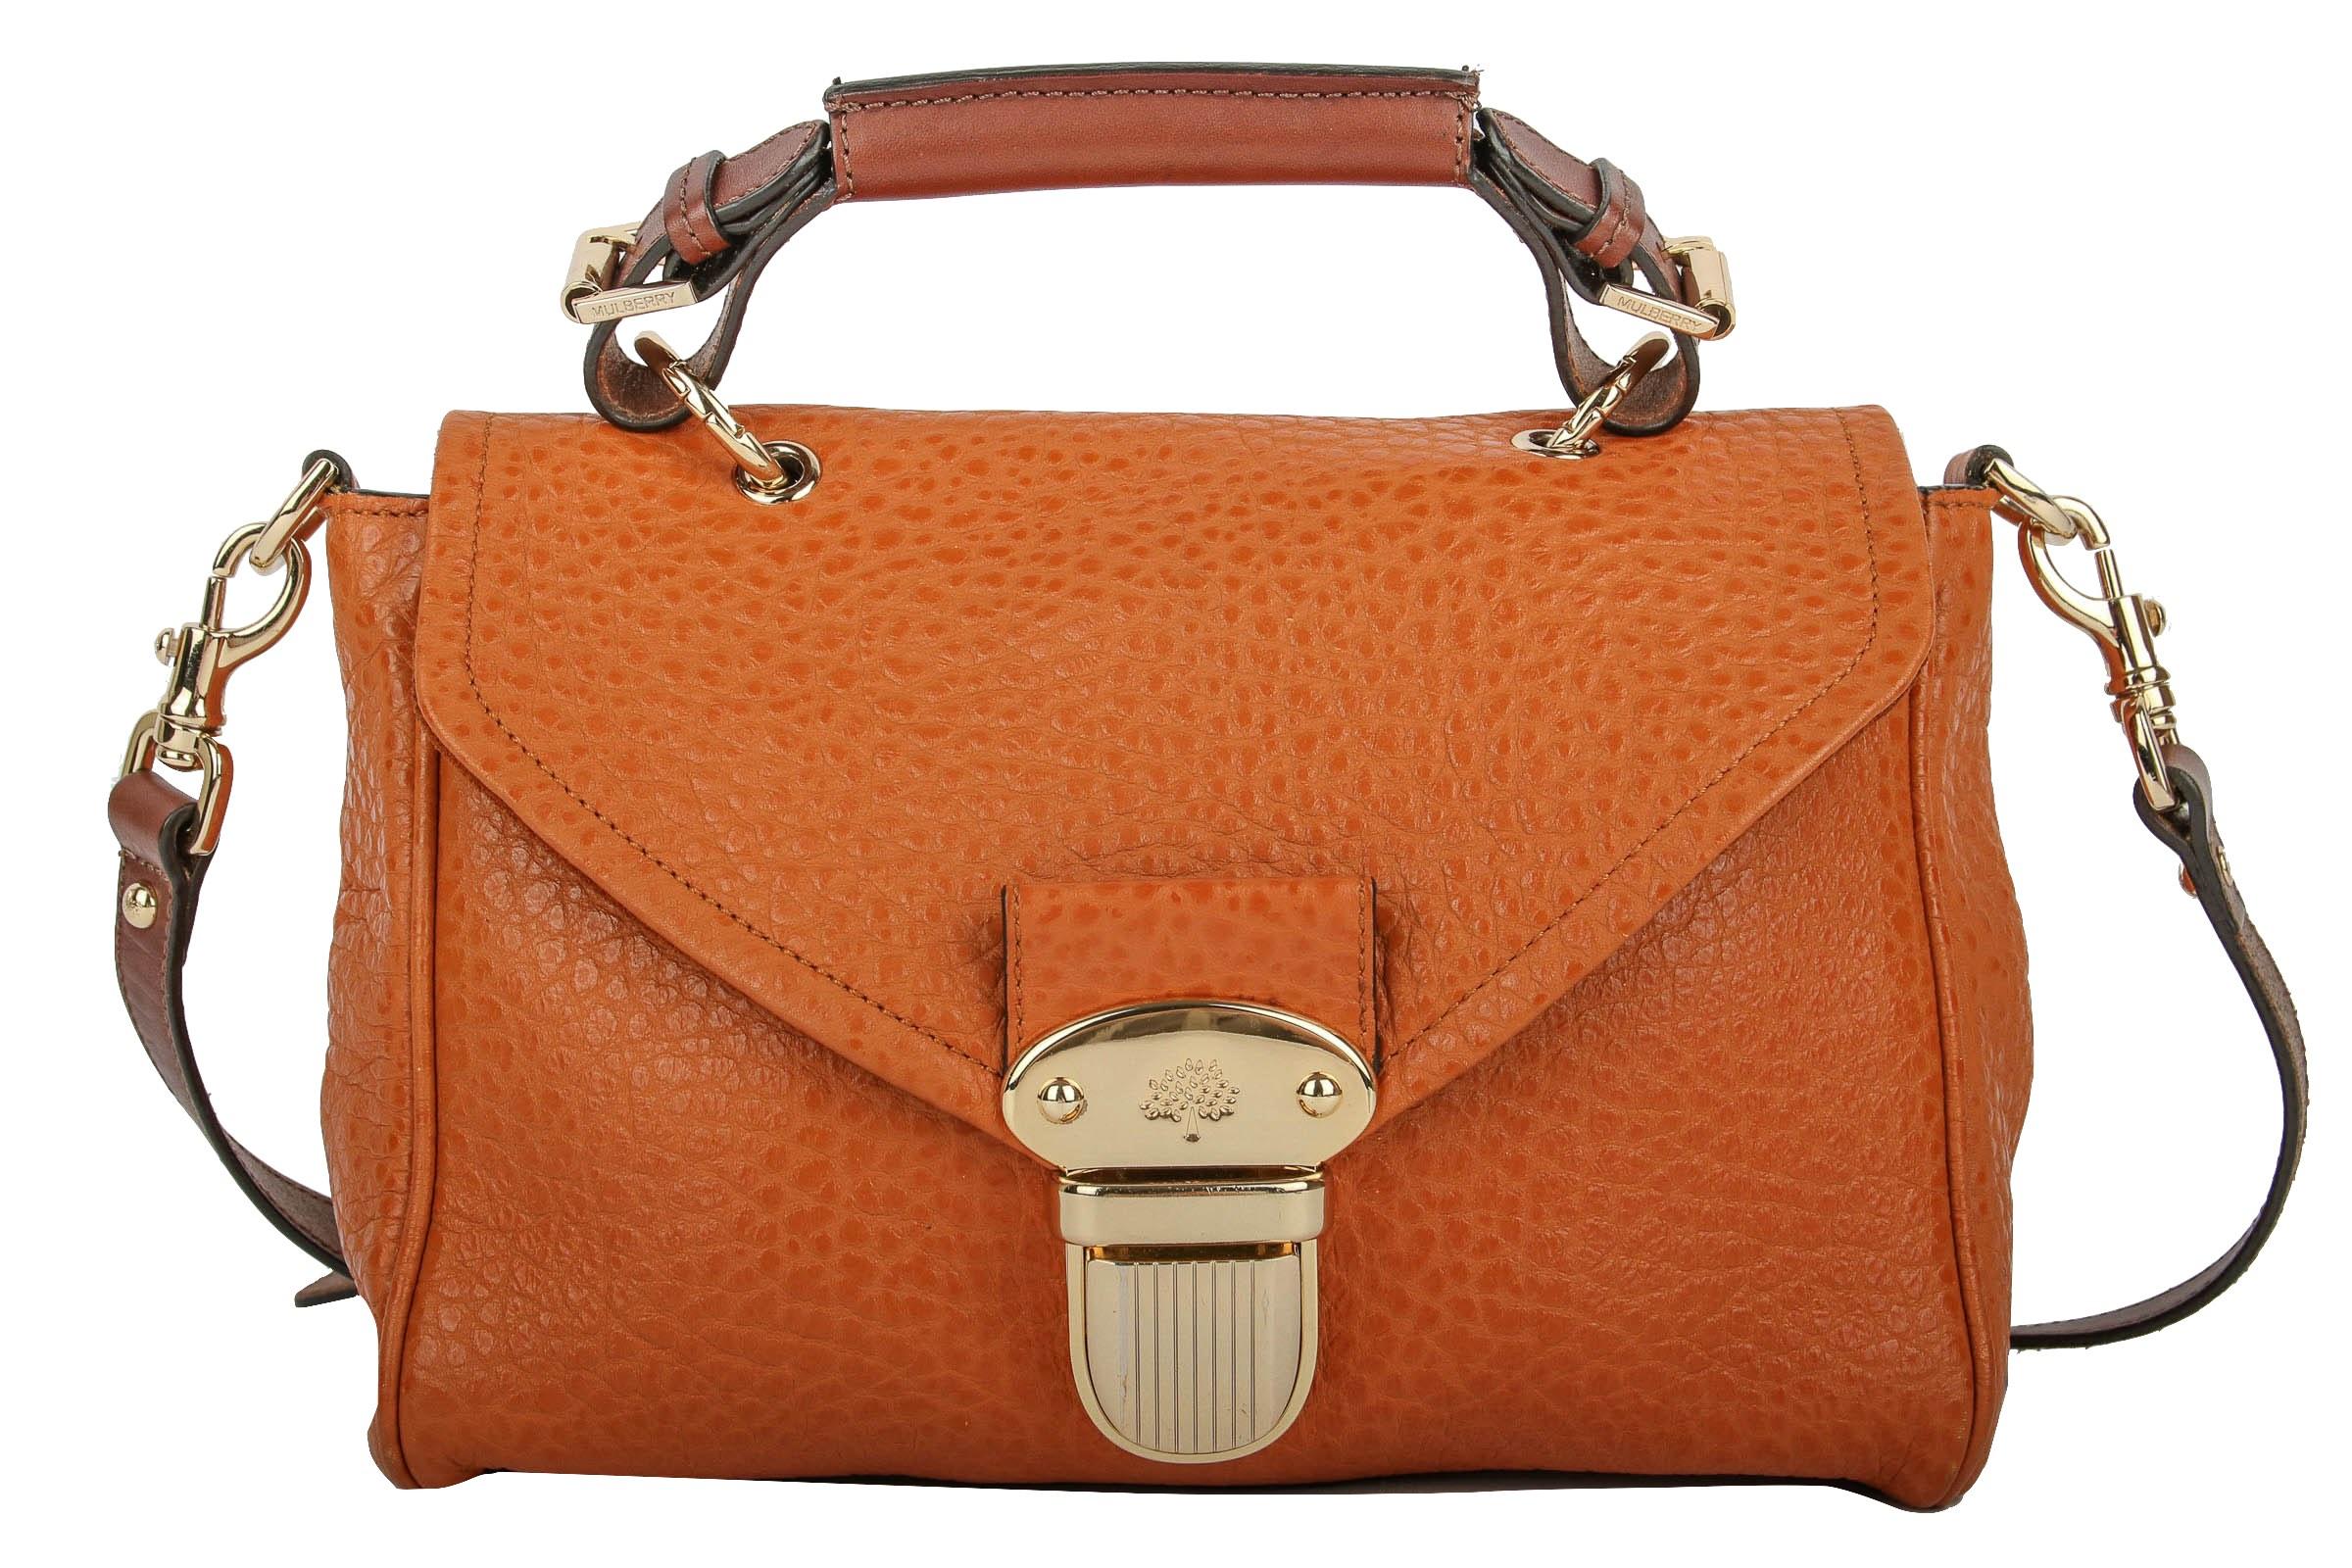 c1db14afb1 Mulberry Handbags & Accessories | Luxussachen.com